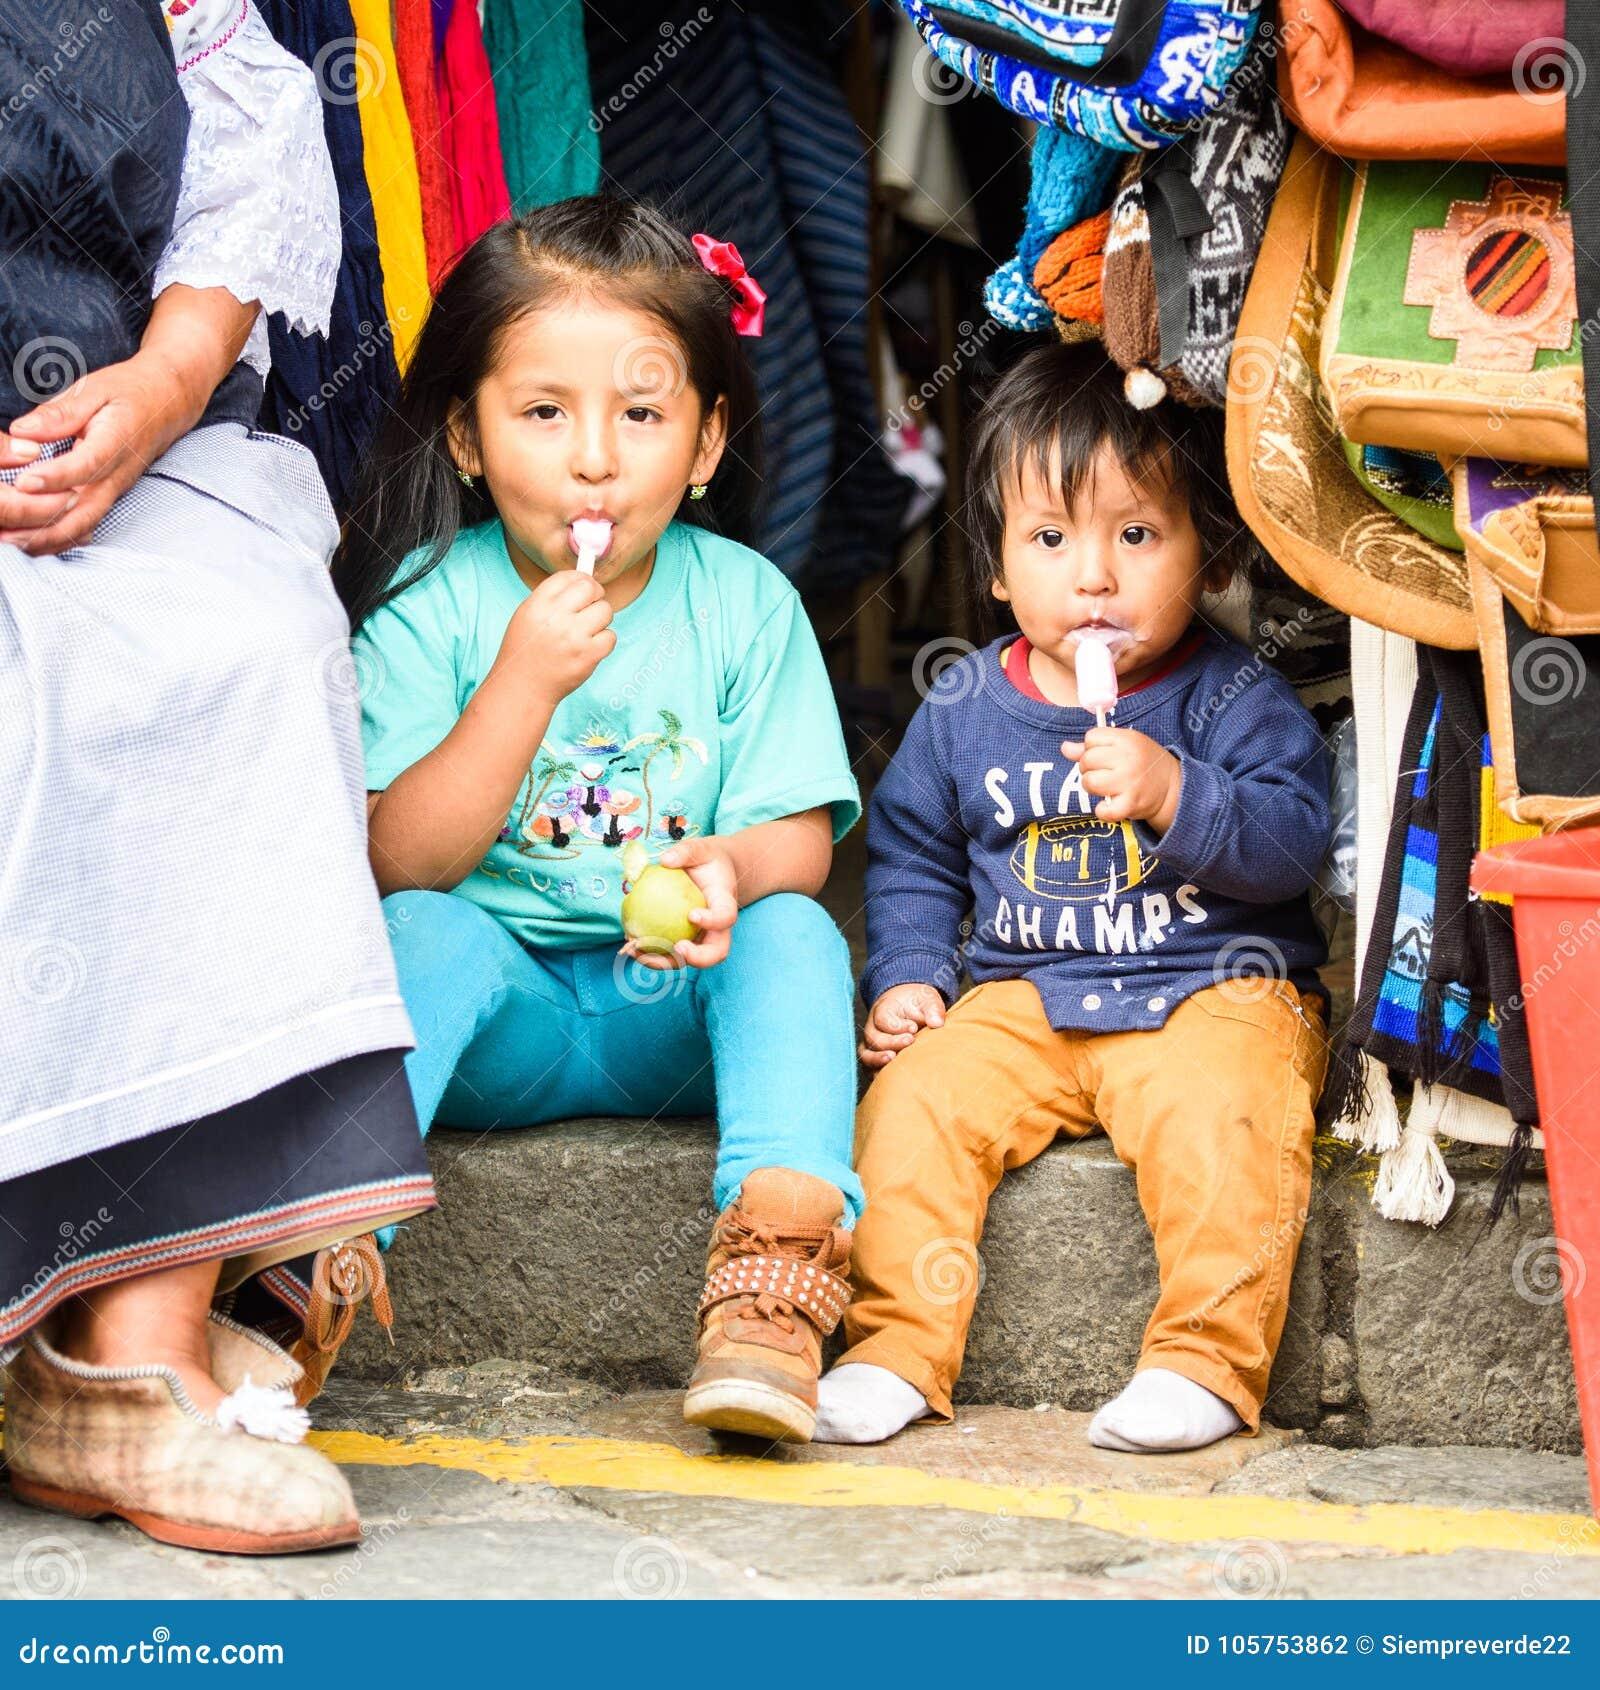 Cuenca ecuador jan 9 2015 unidentified ecuadorian children sit at the market 719 of ecuadorian people belong to the mestizo ethnic group